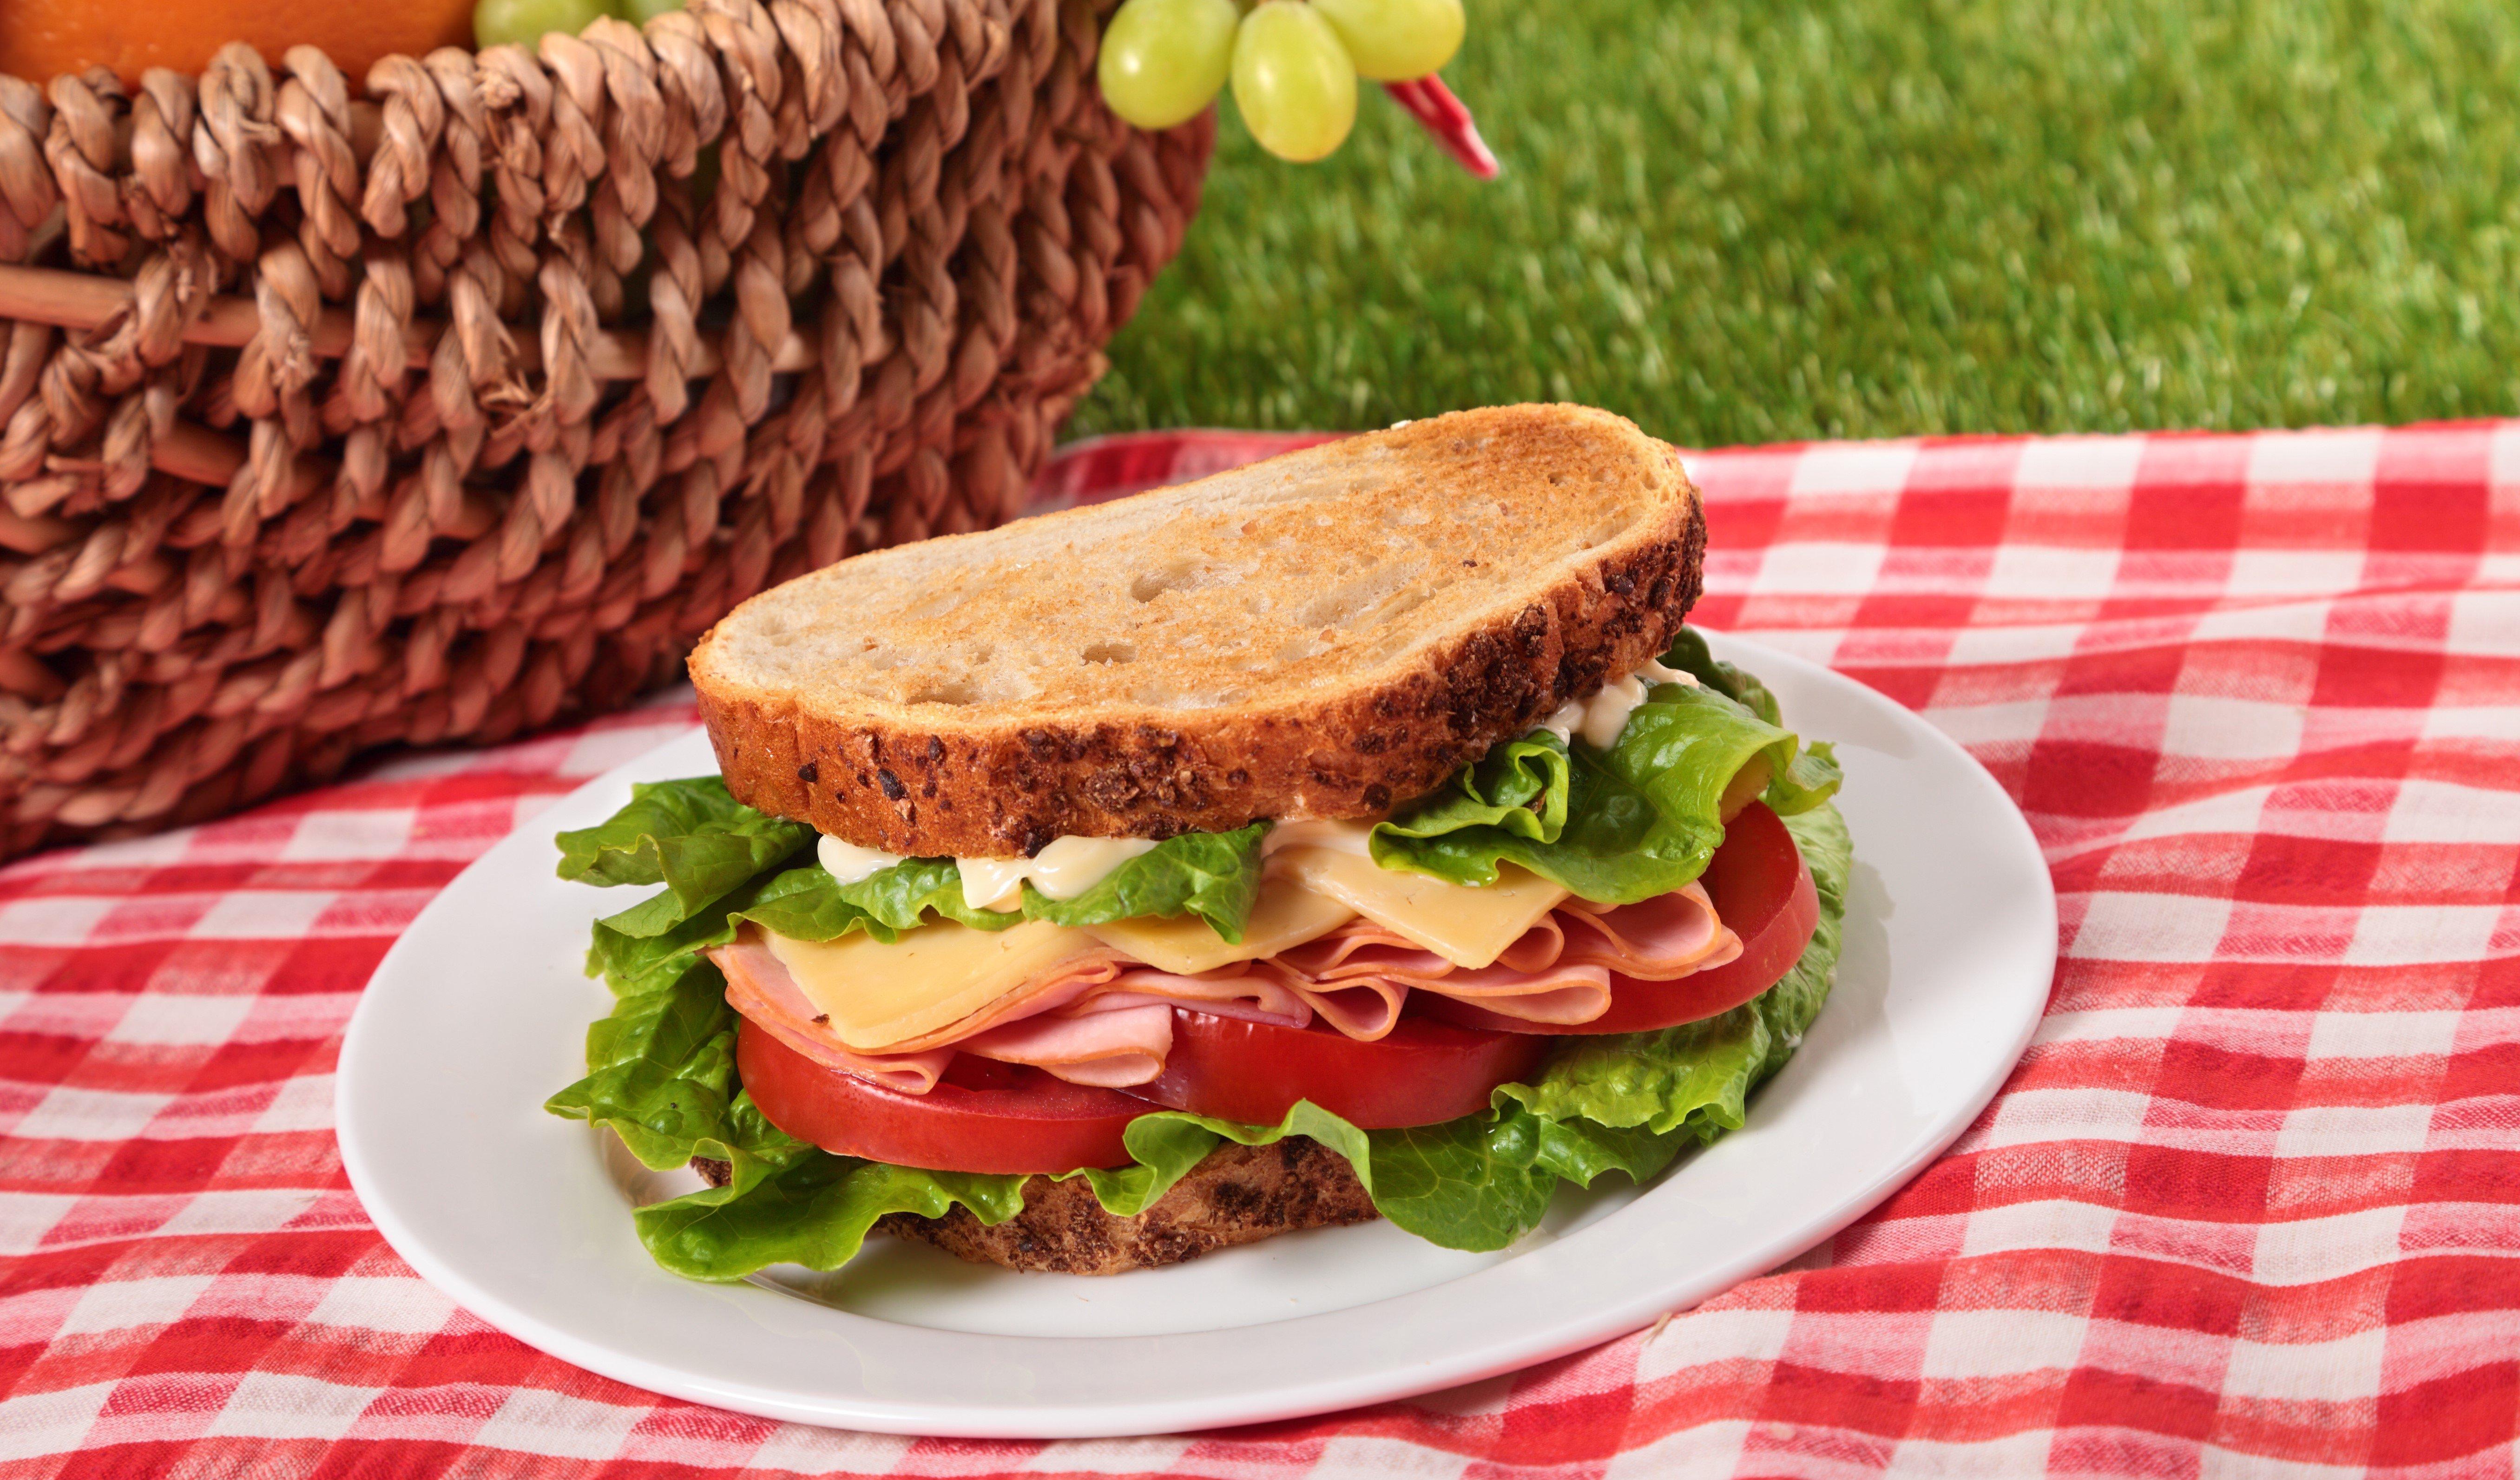 Sandwich, Picnic Cropped